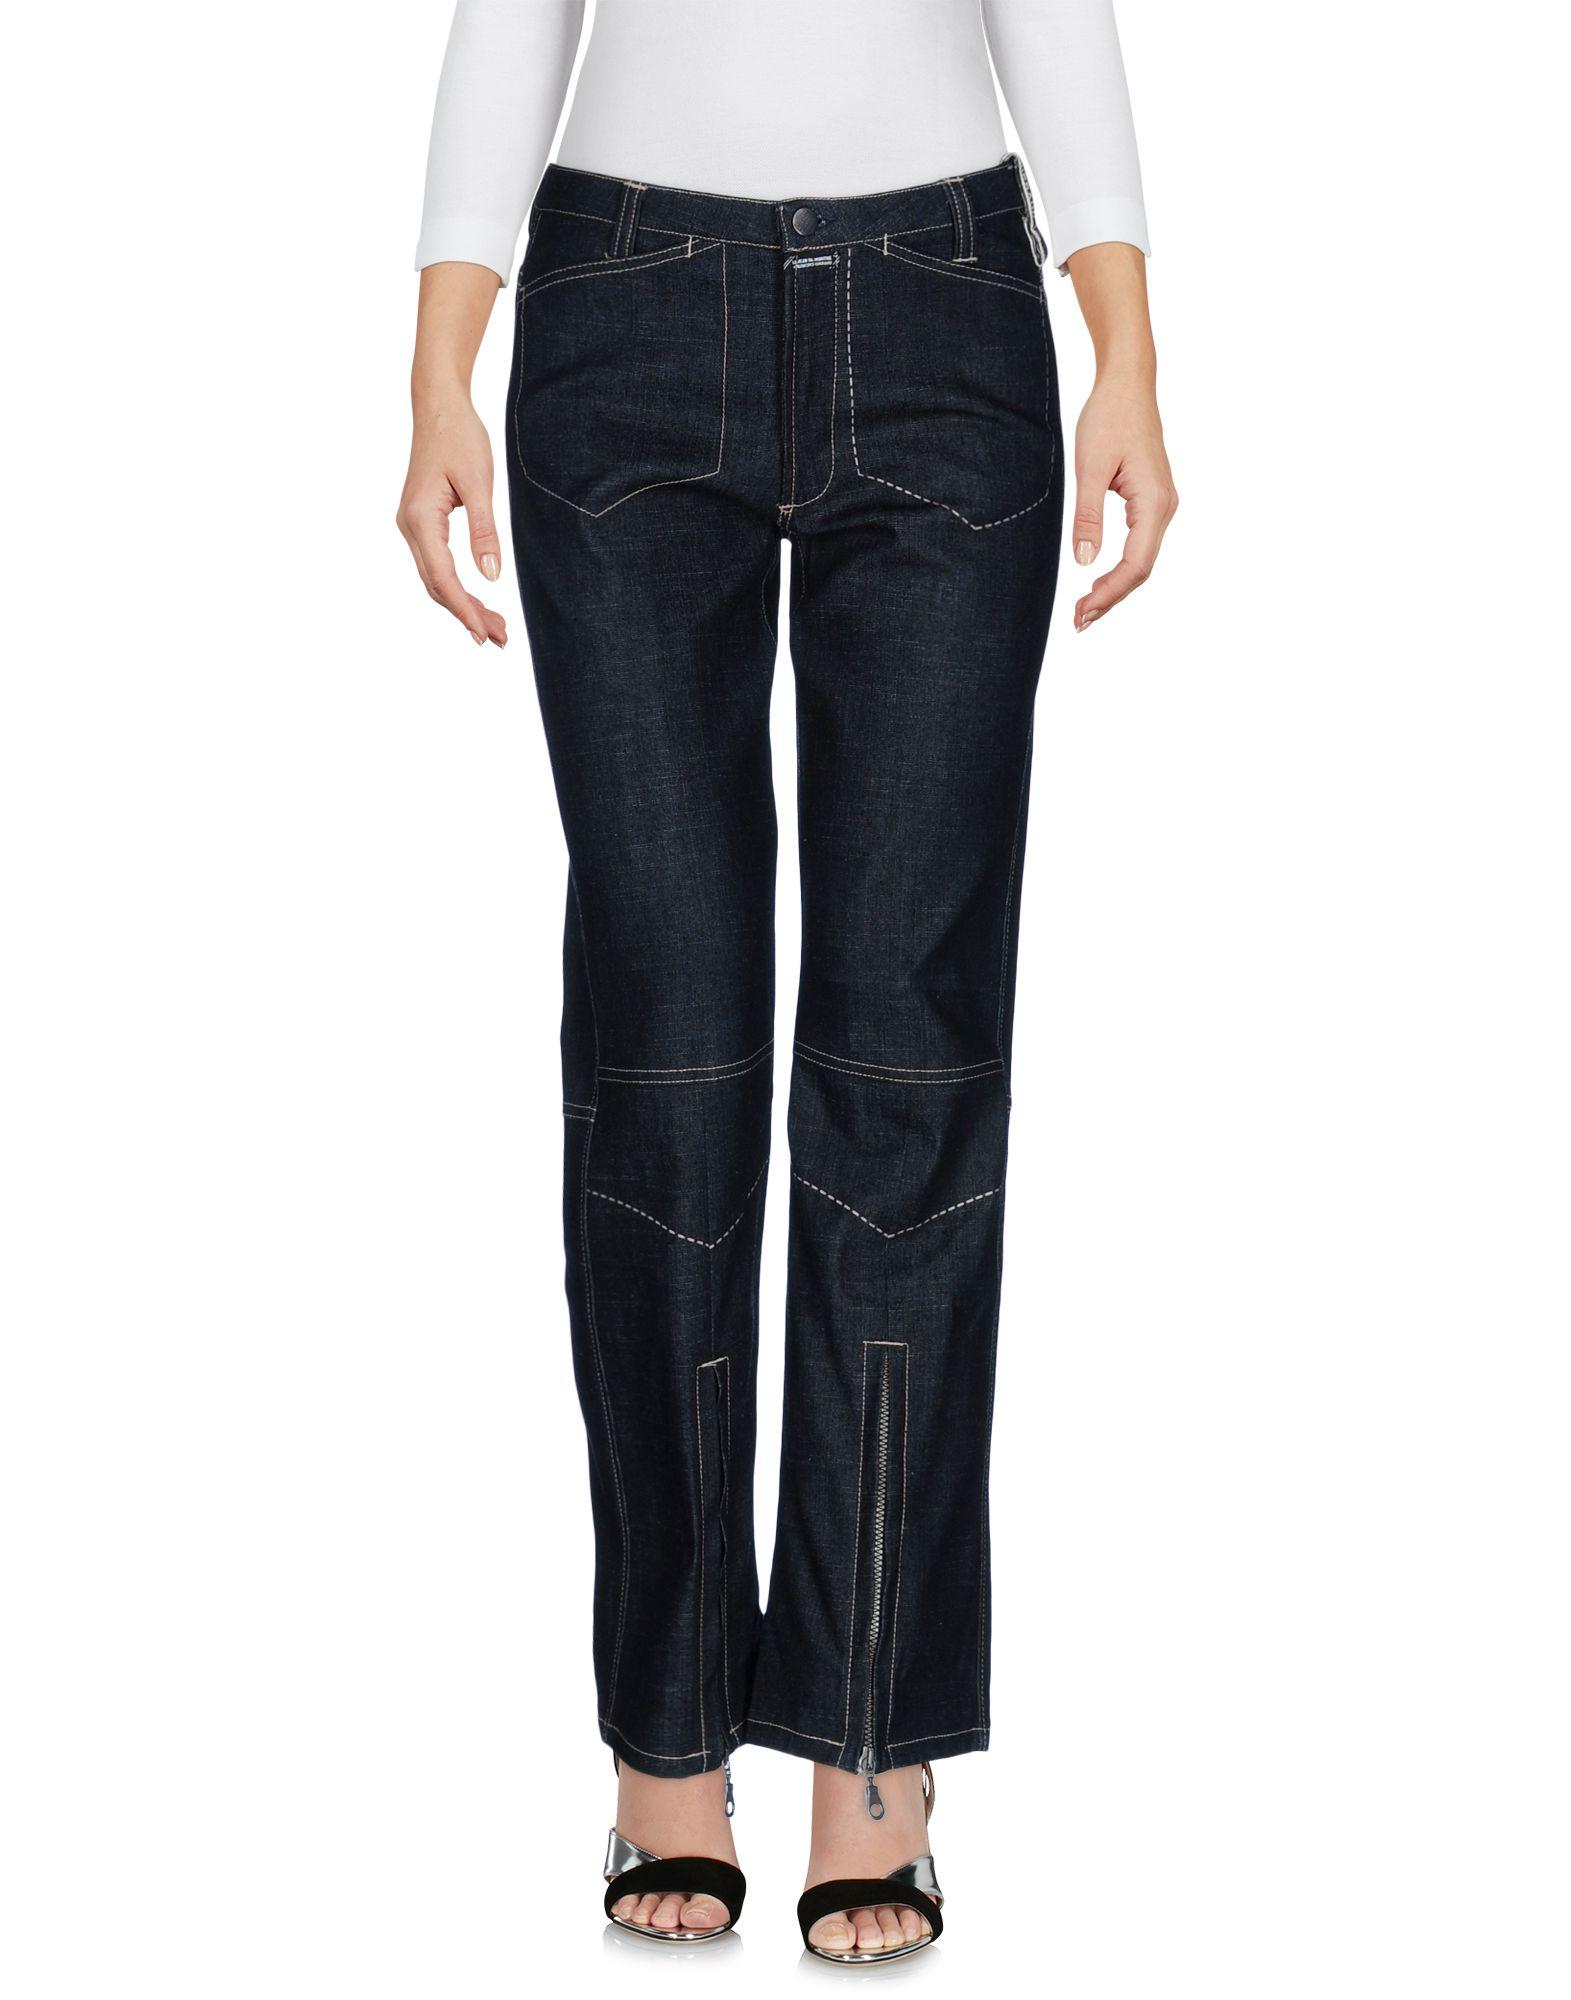 LE JEAN DE MARITHÉ + FRANÇOIS GIRBAUD Джинсовые брюки le jean de marithé françois girbaud джинсовая юбка